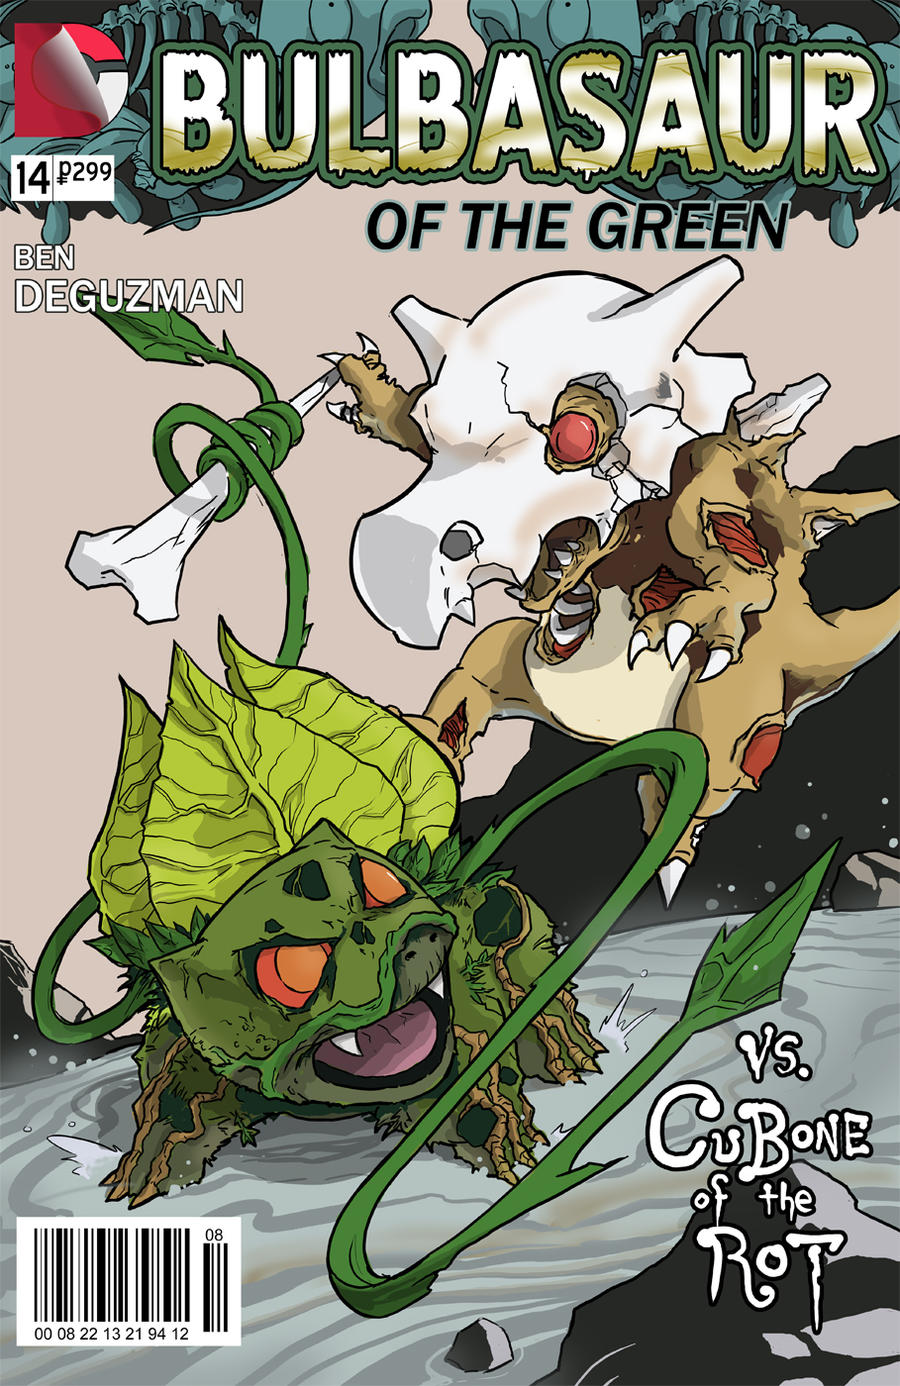 Bulbasaur / Swamp Thing mashup by kinjamin